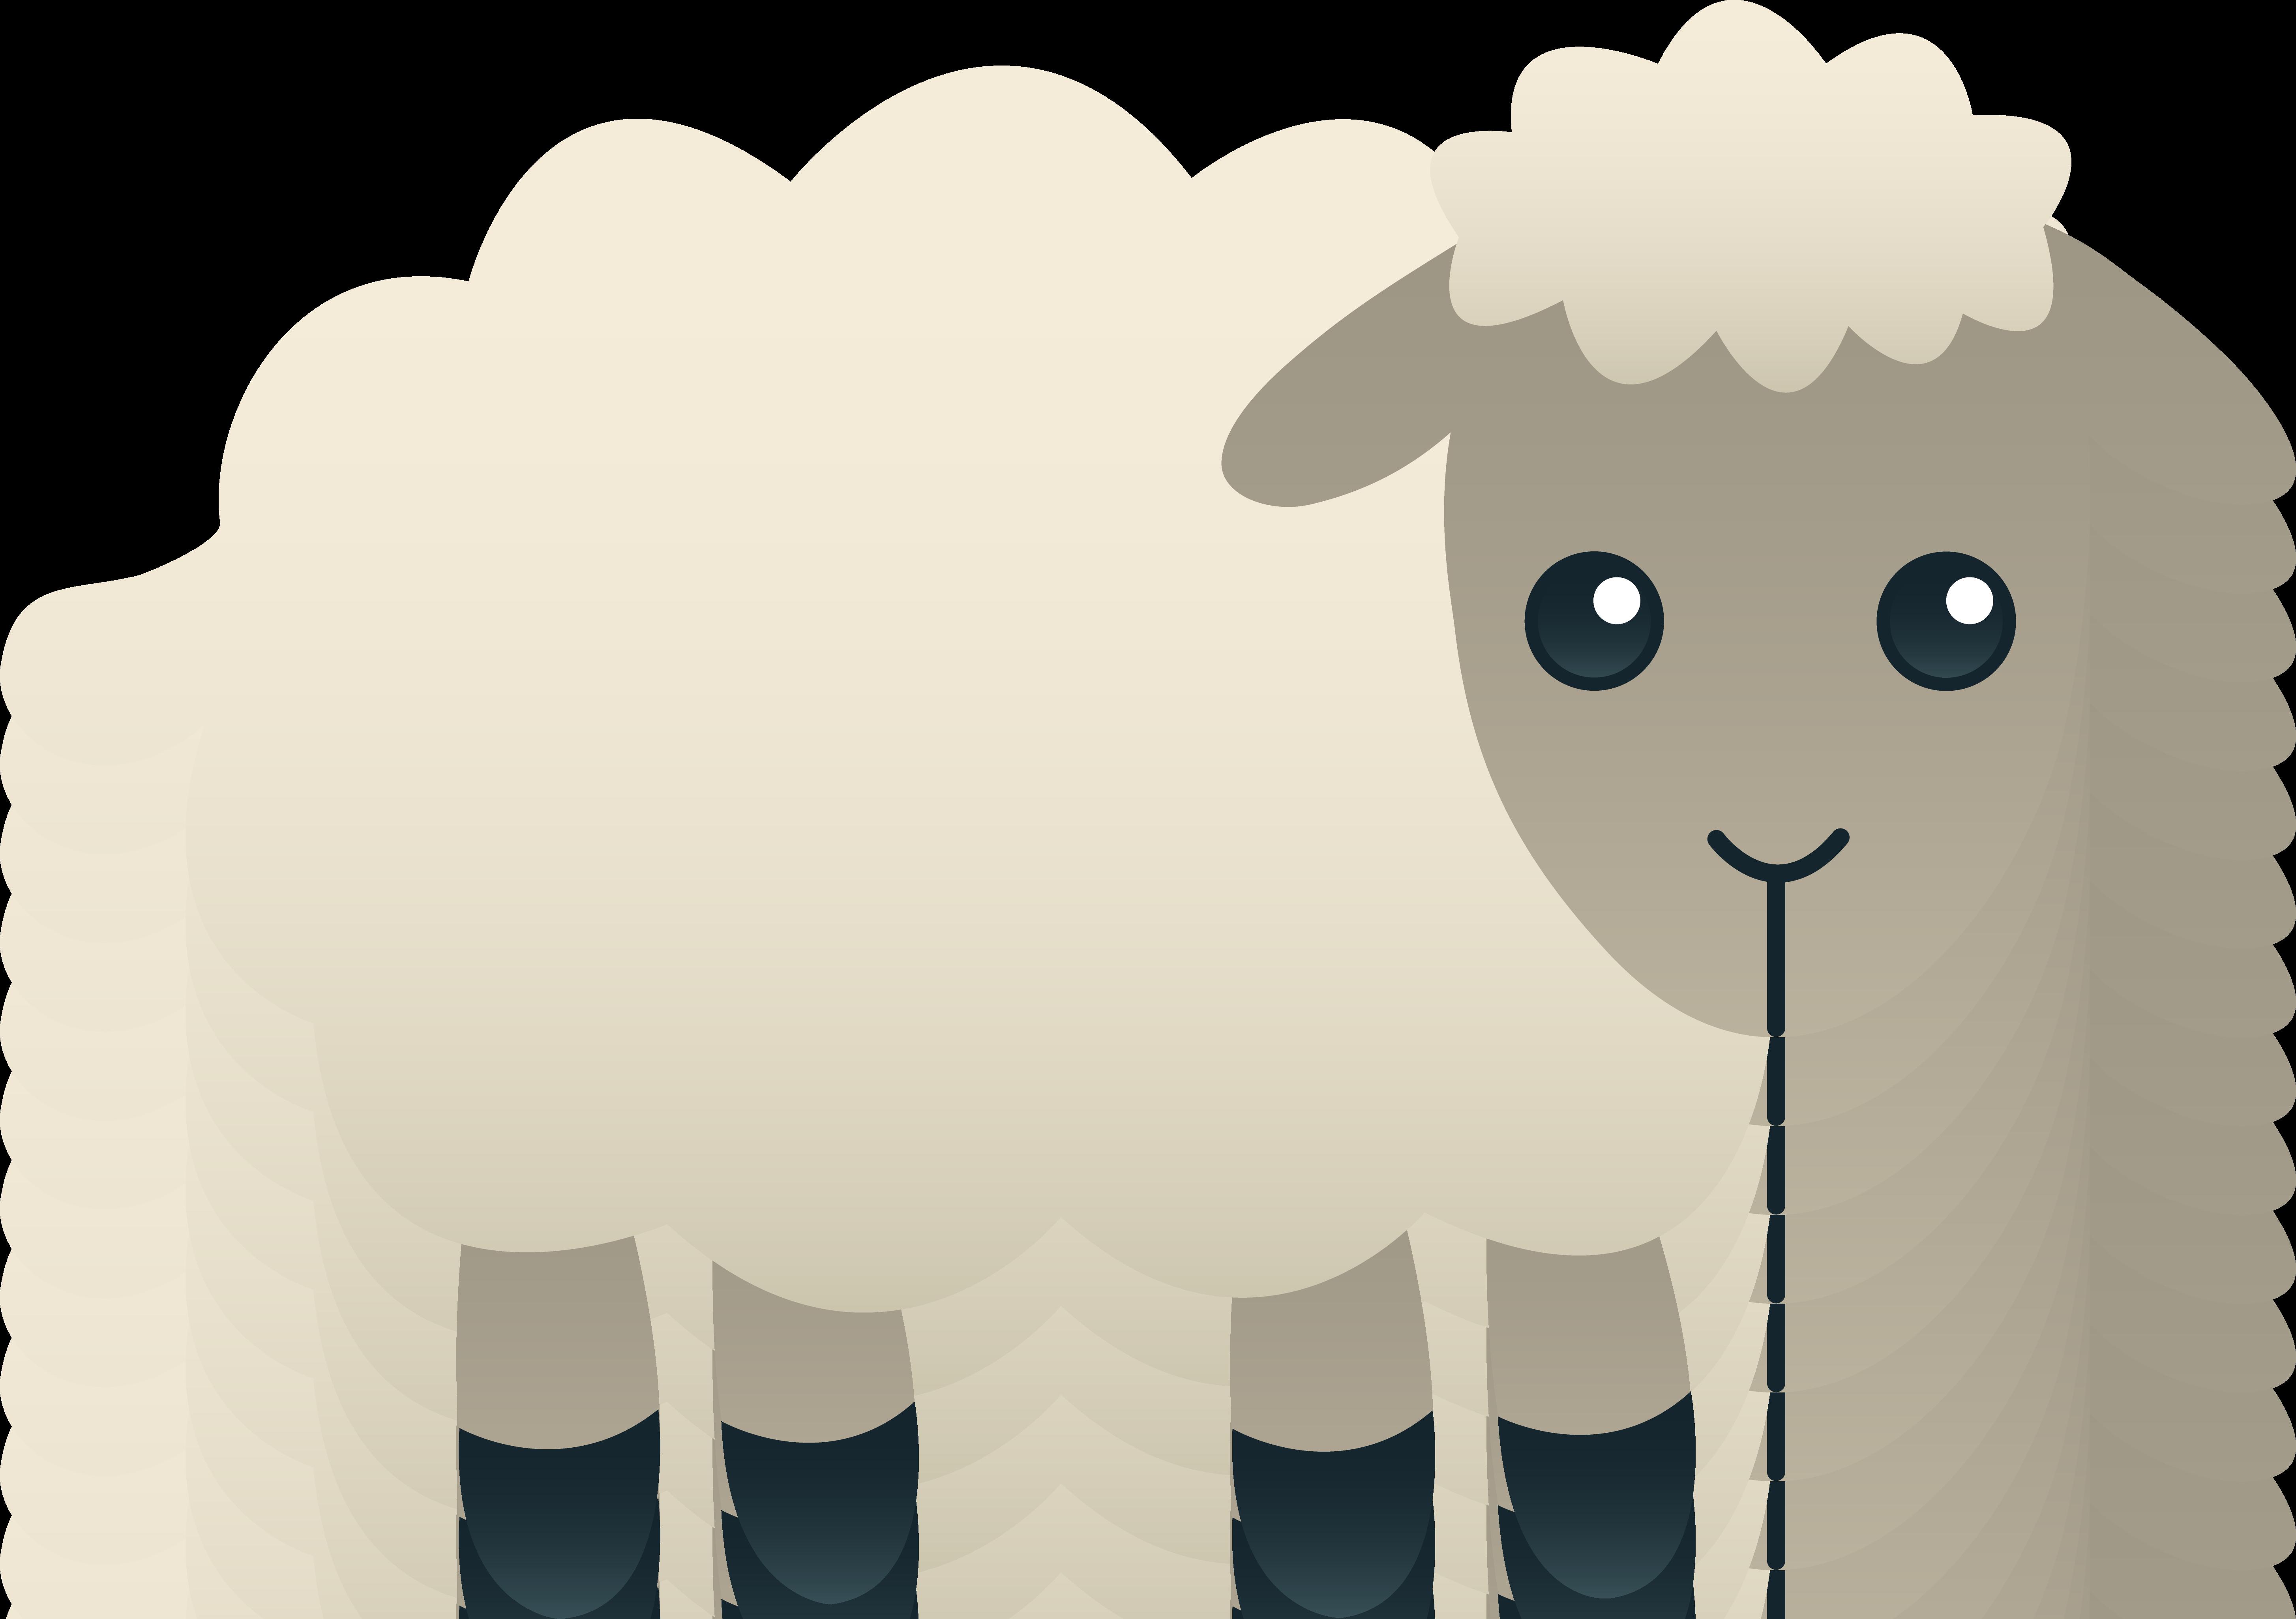 Fluffy white sheep aiti. Clipart spring lamb